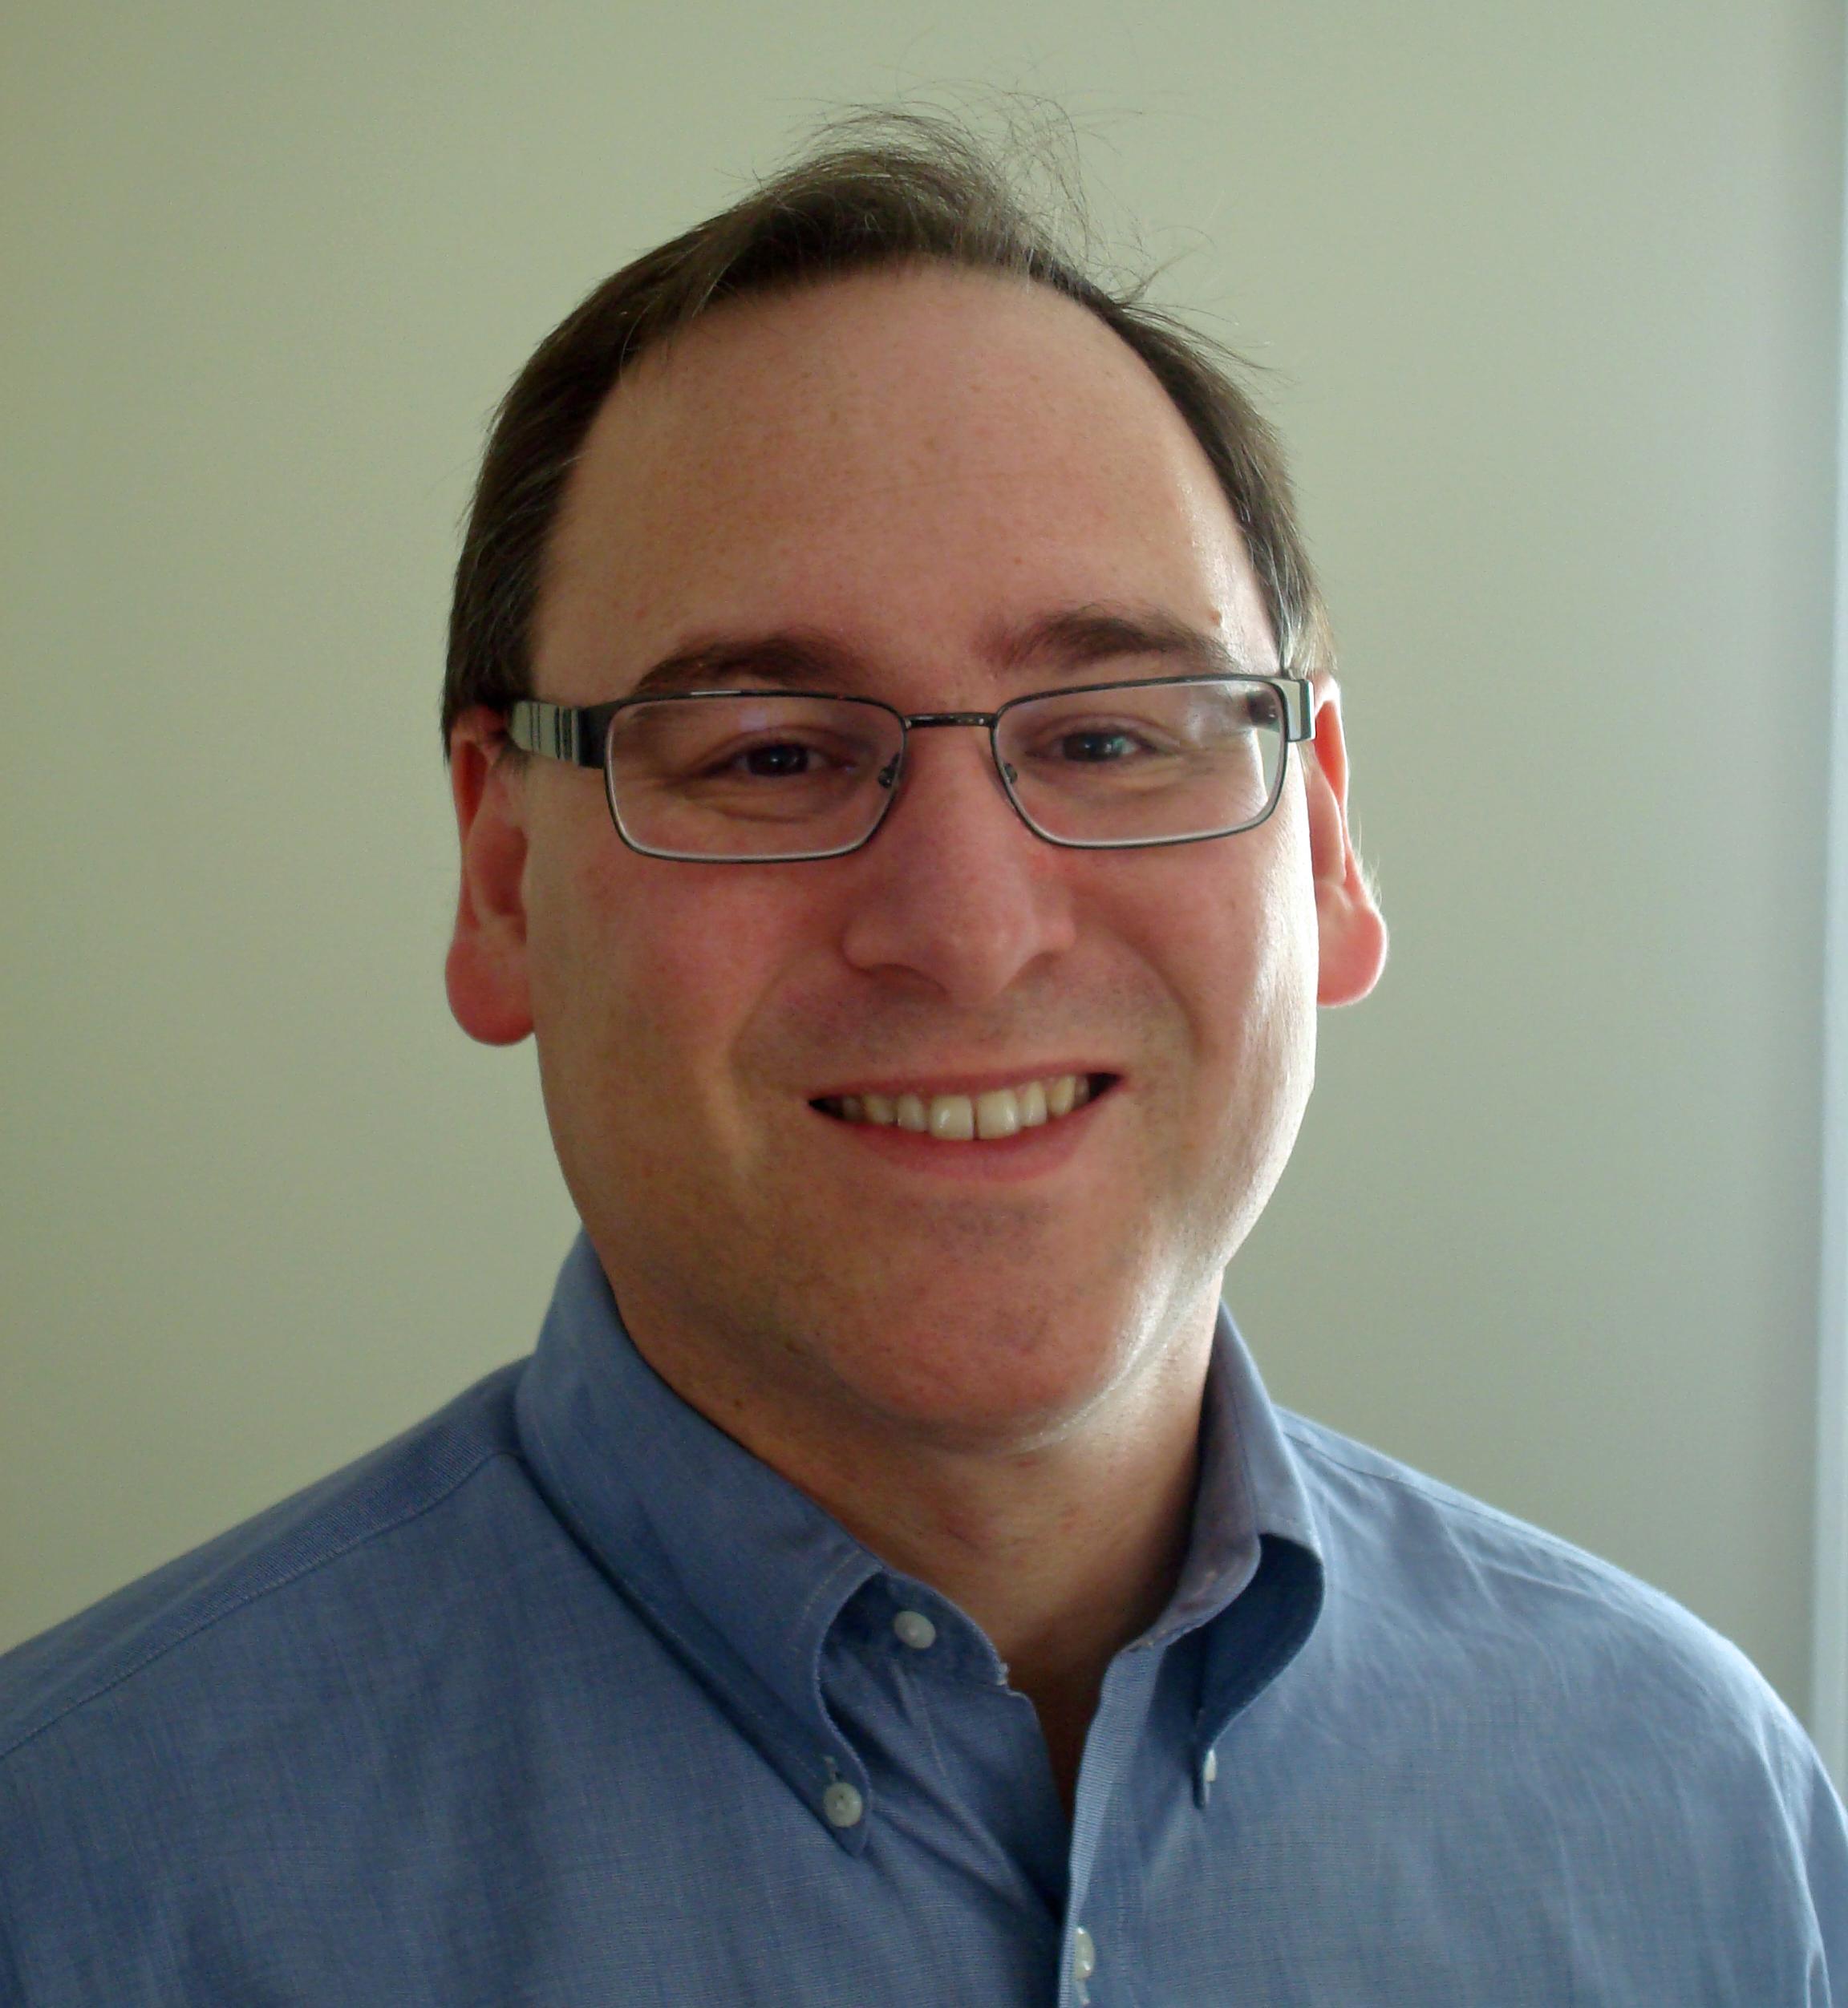 Photo of Dr. Philip Friedlander